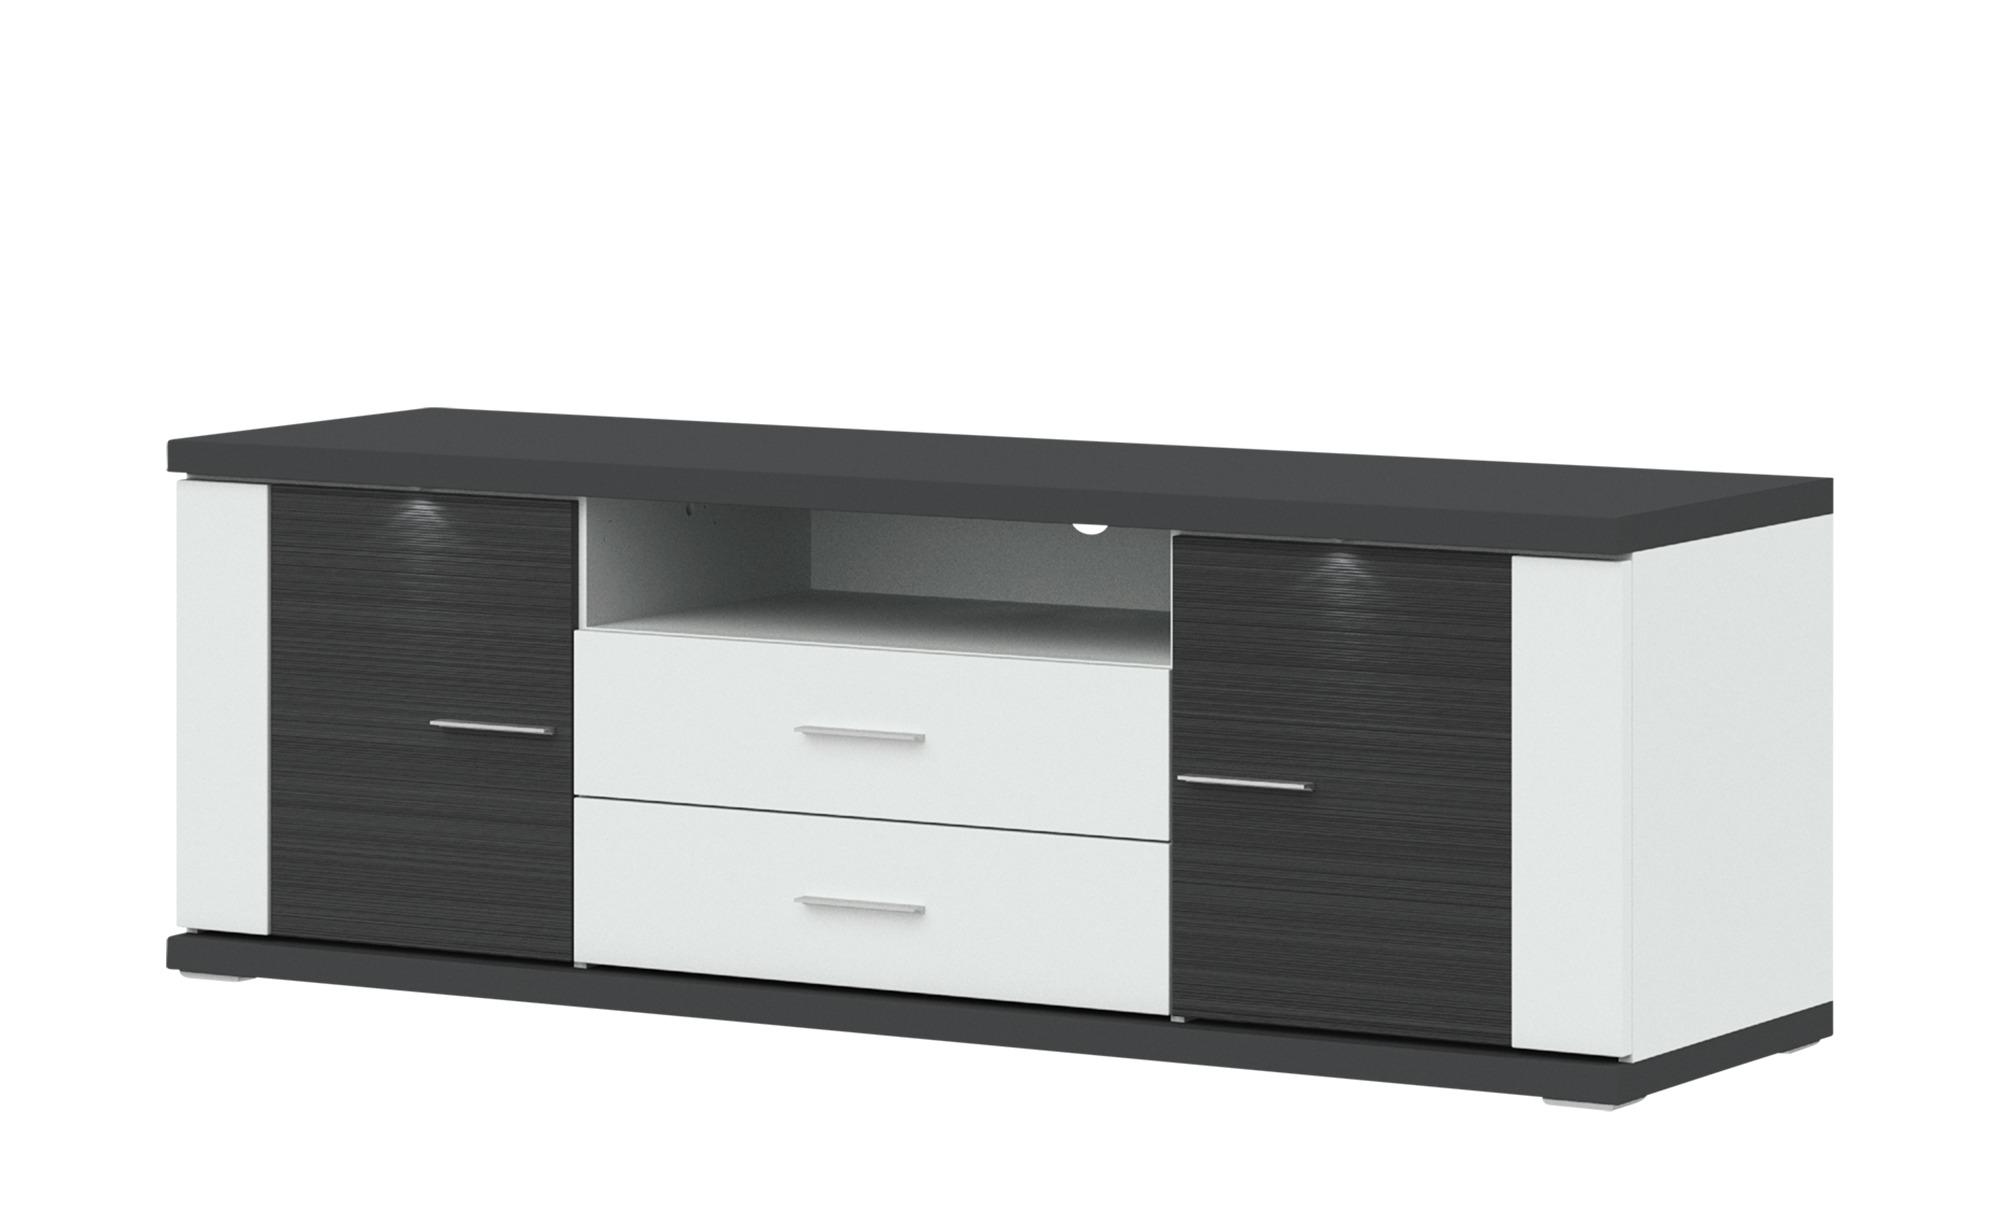 uno lowboard titan breite 180 cm h he 60 cm online. Black Bedroom Furniture Sets. Home Design Ideas